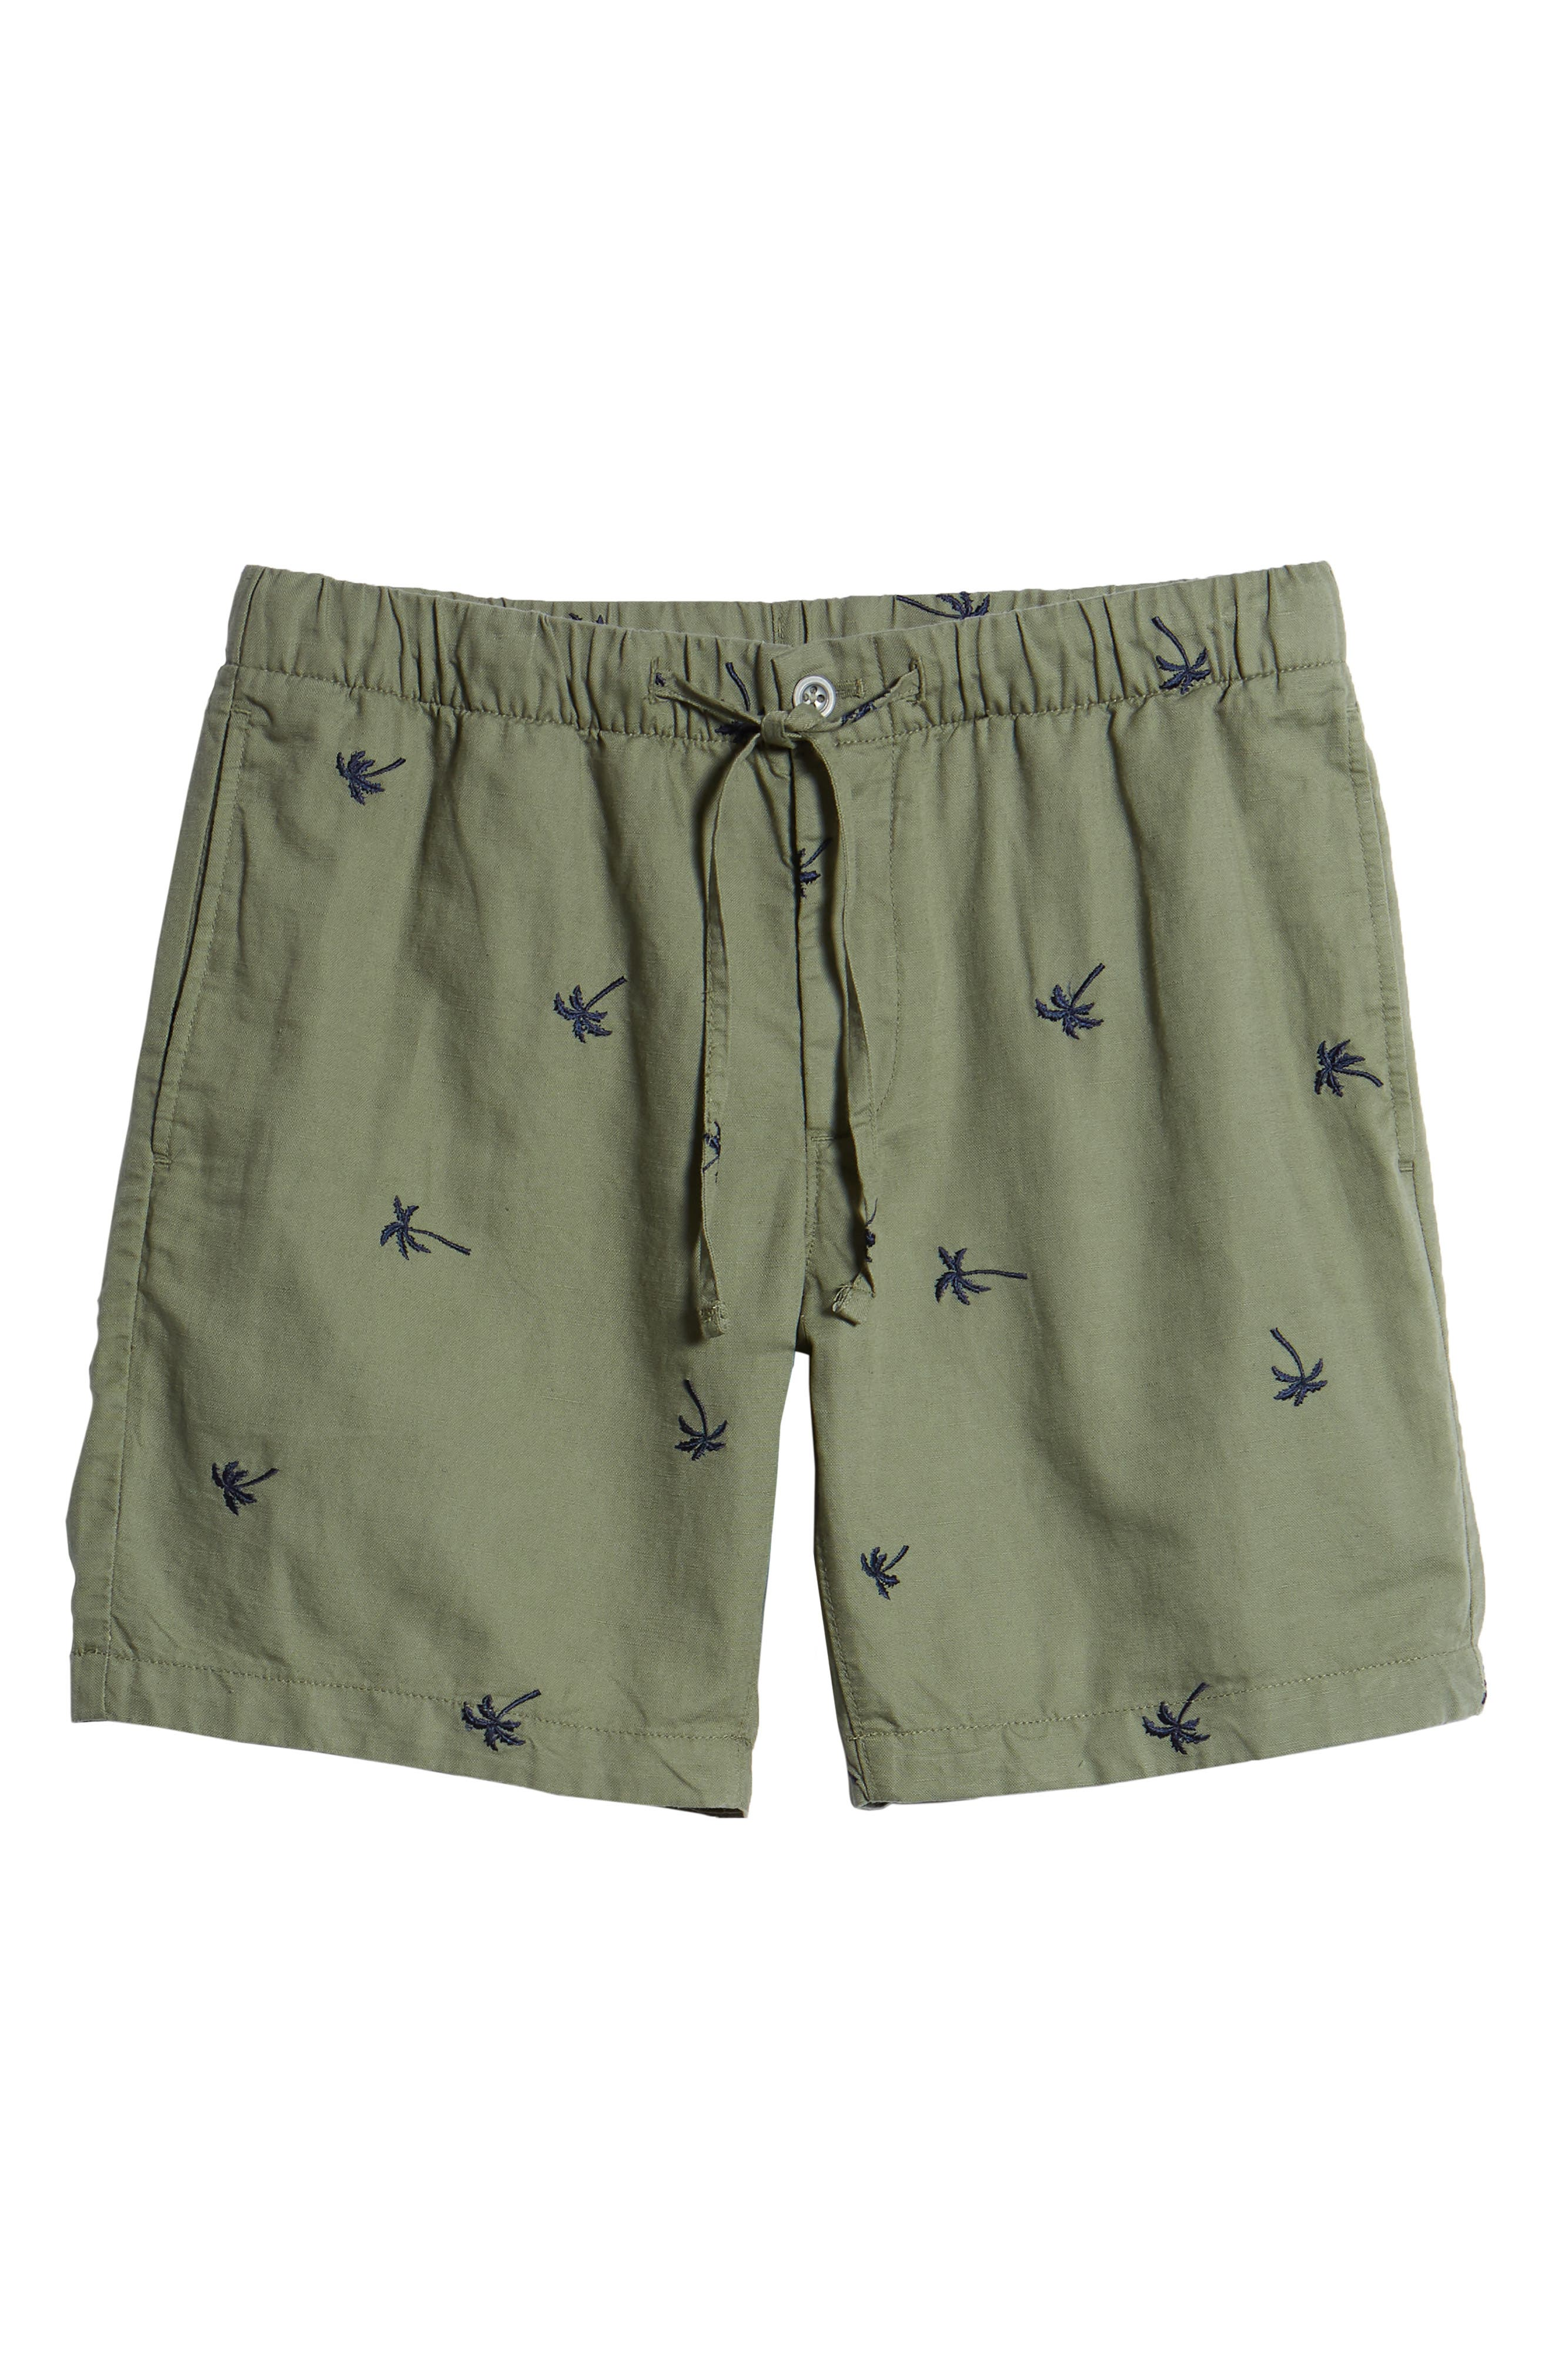 Print Beach Shorts,                             Alternate thumbnail 6, color,                             300